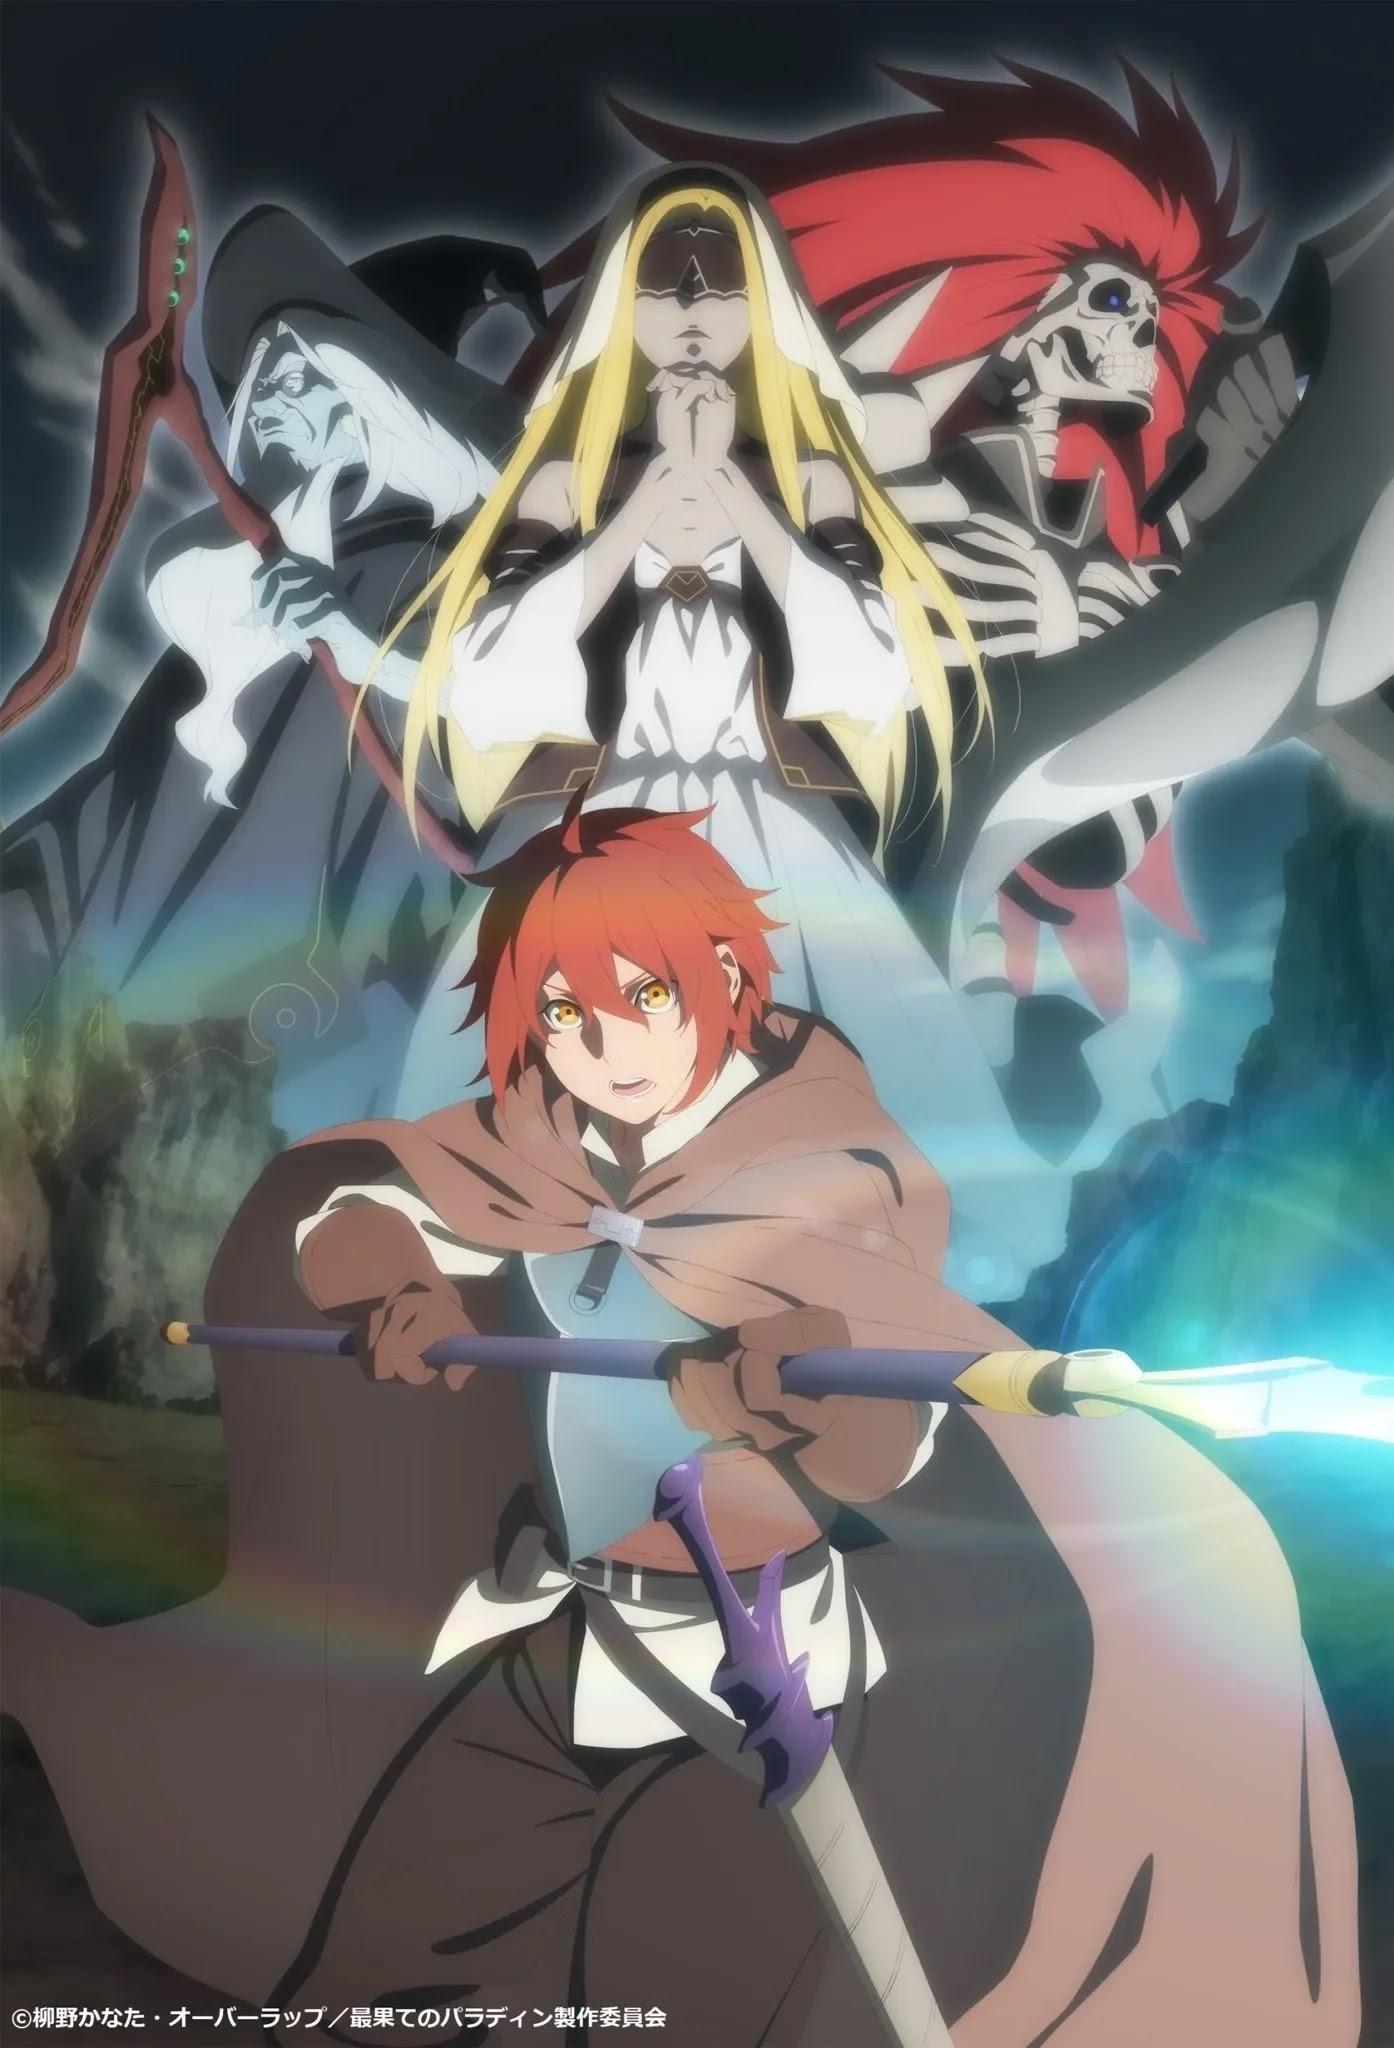 Anime Saihate no Paladin Divulga seu Terceiro Vídeo Promocional e Visual Chave